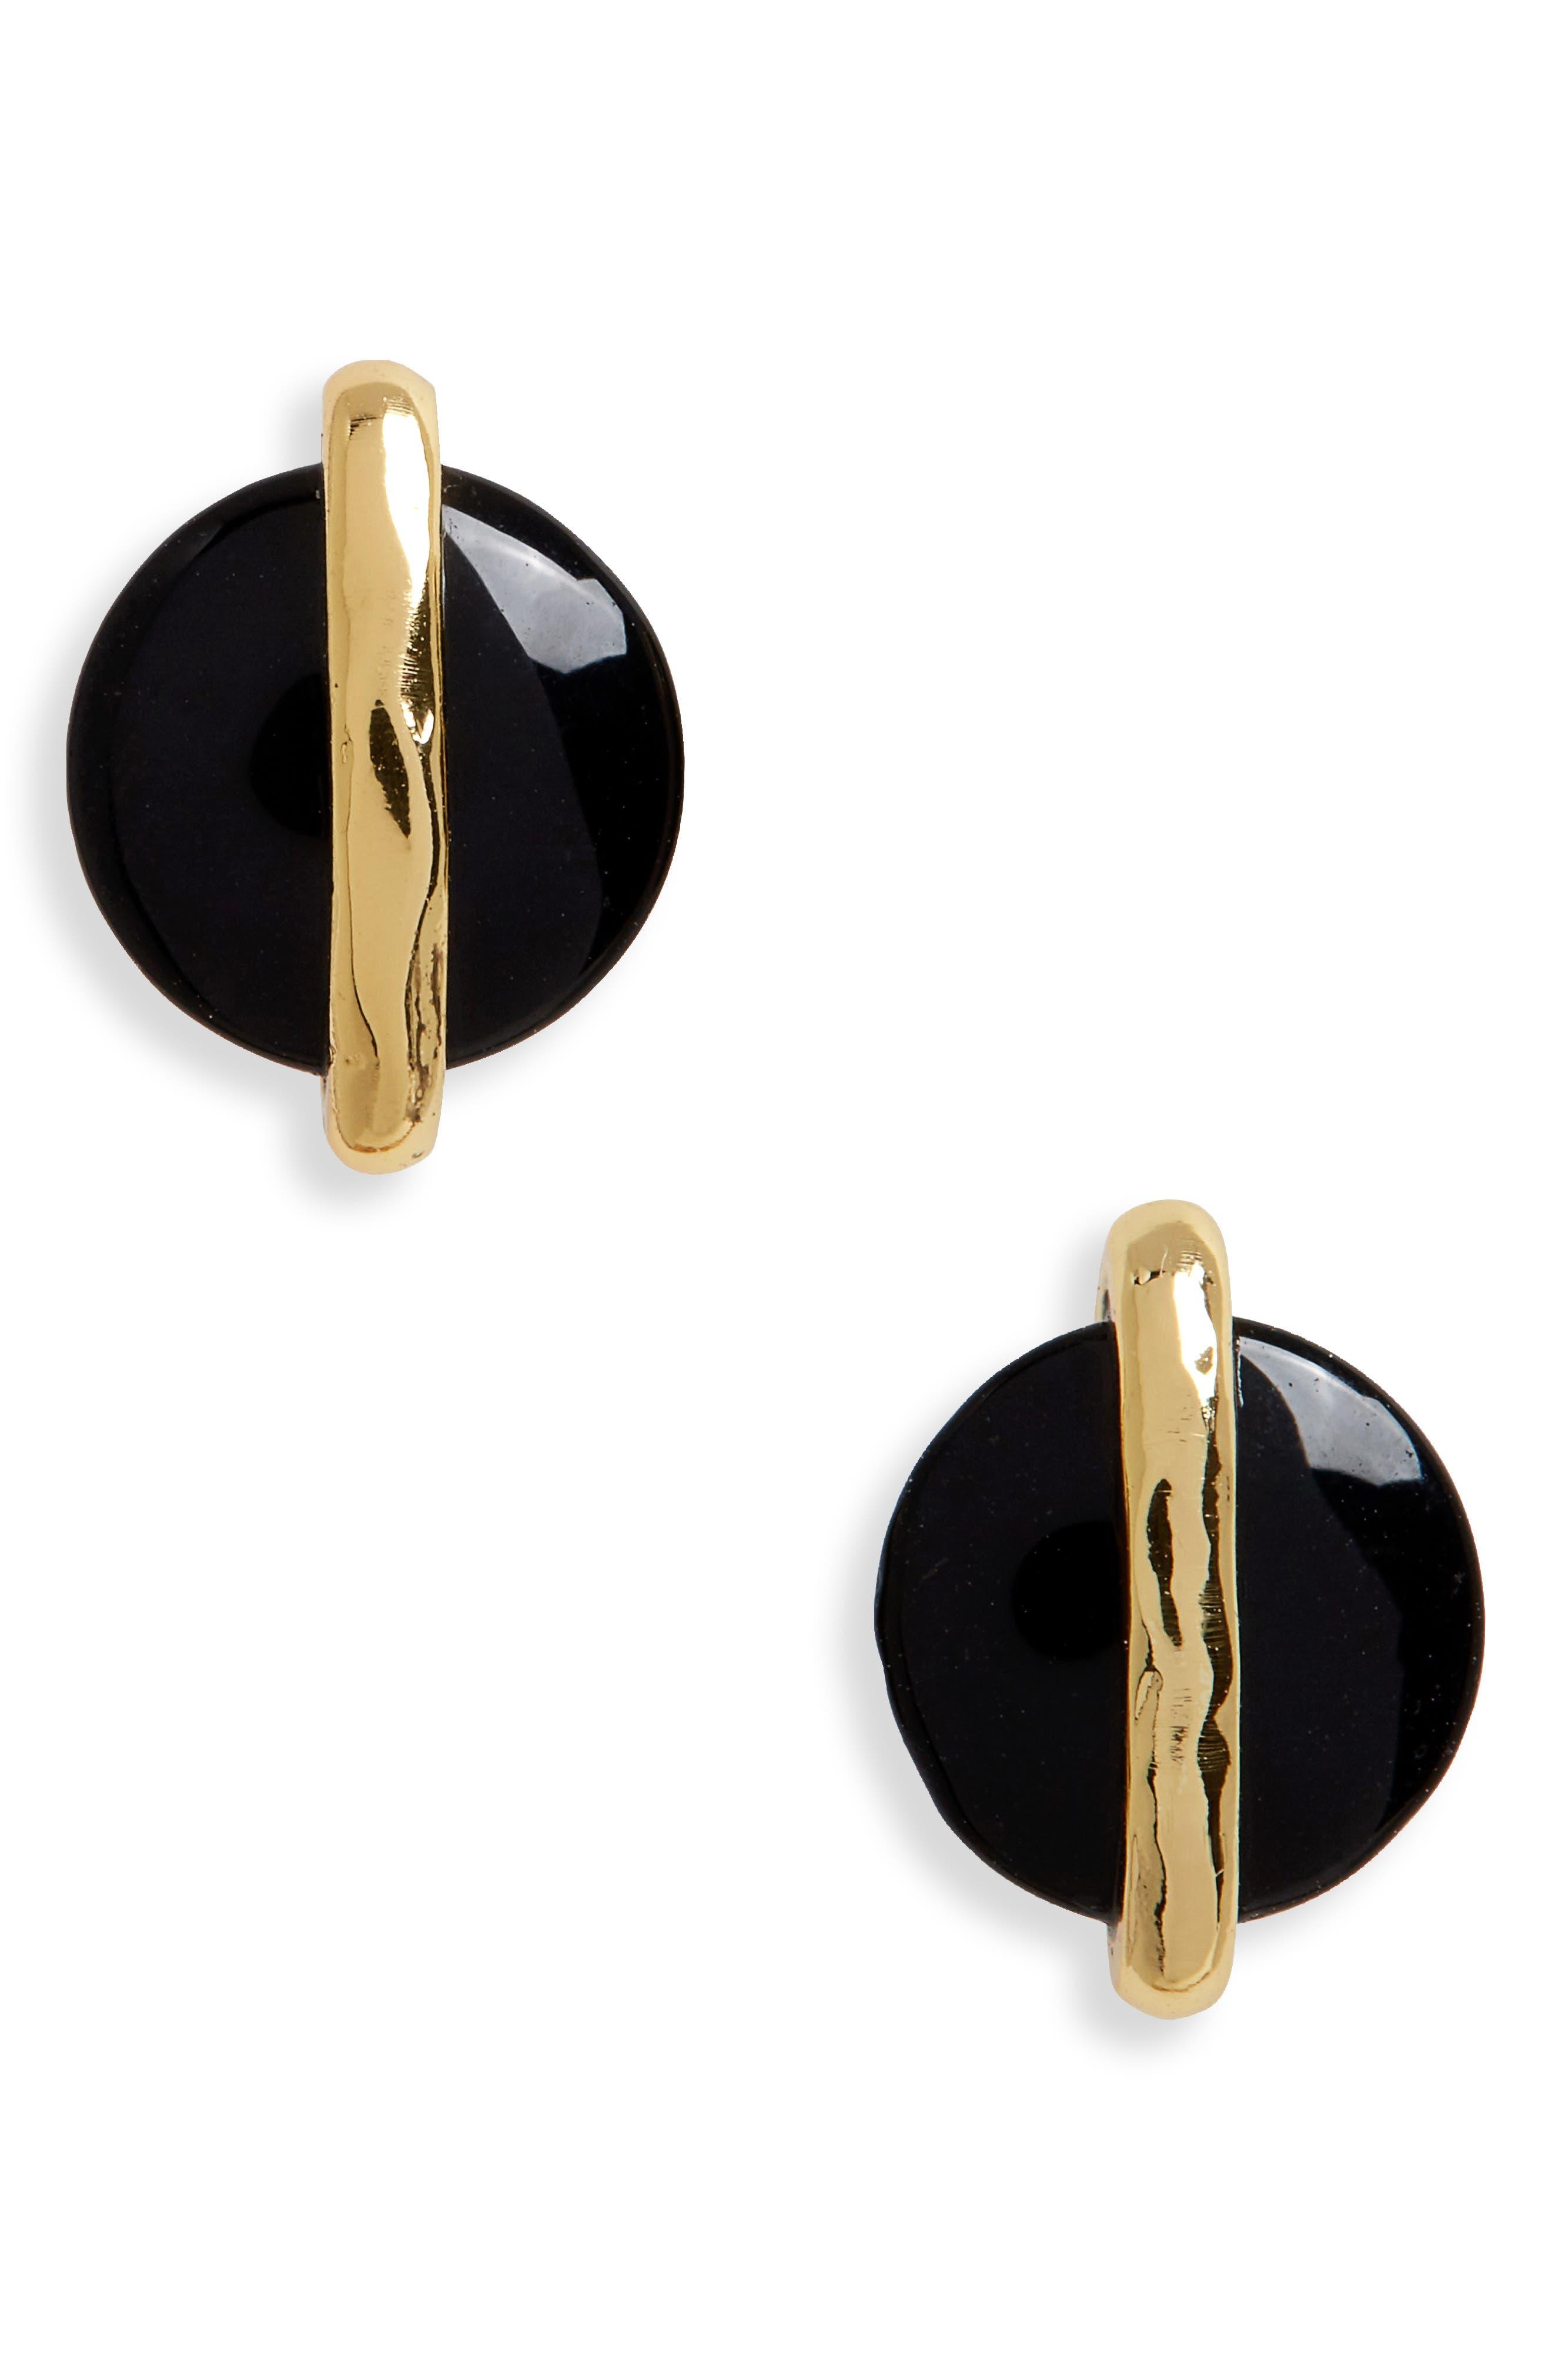 Brinn Stud Earrings,                             Main thumbnail 1, color,                             BLACK ONYX